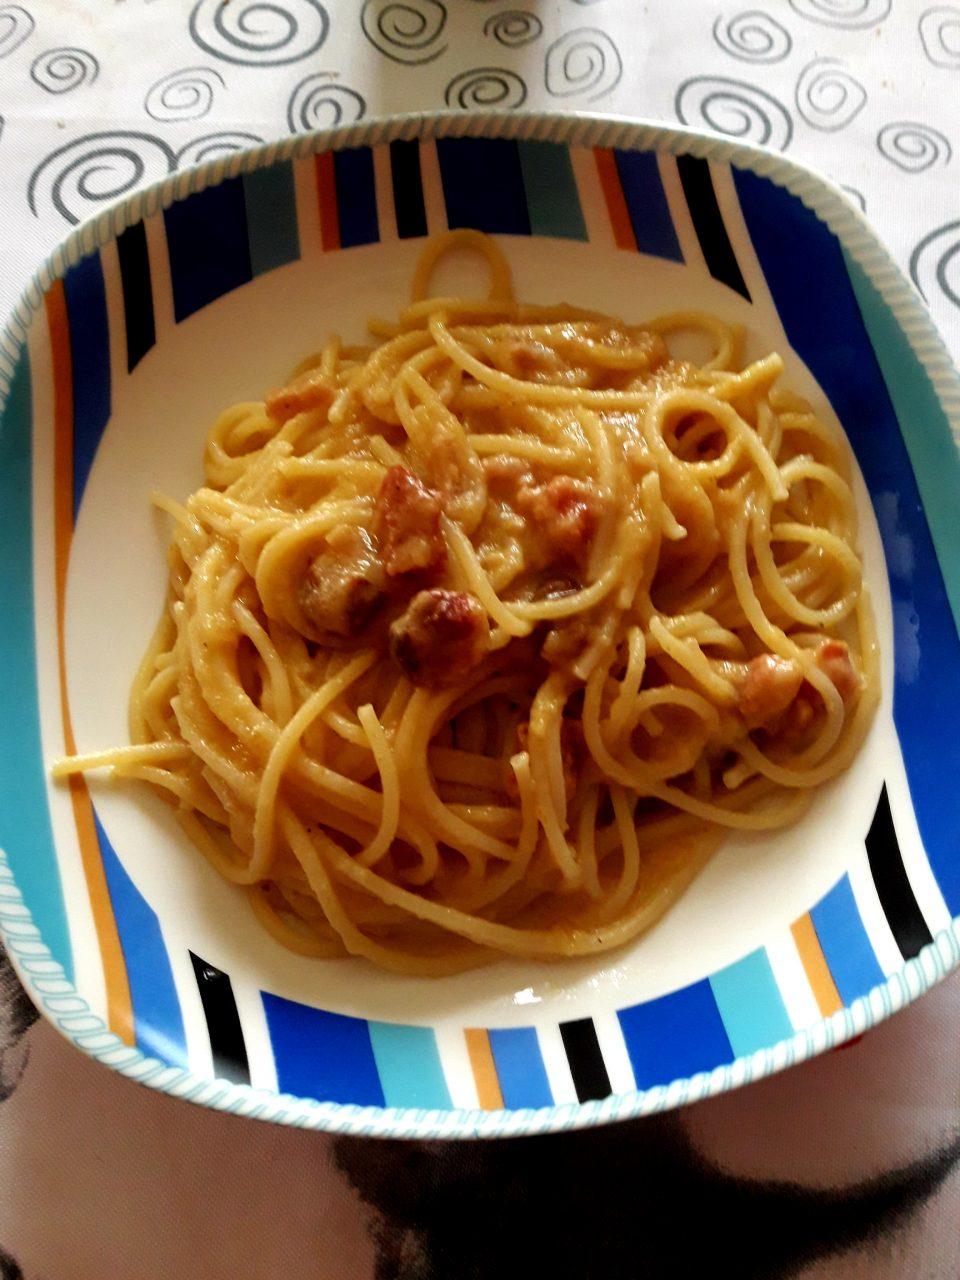 Spaghetti all'amatriciana dorata